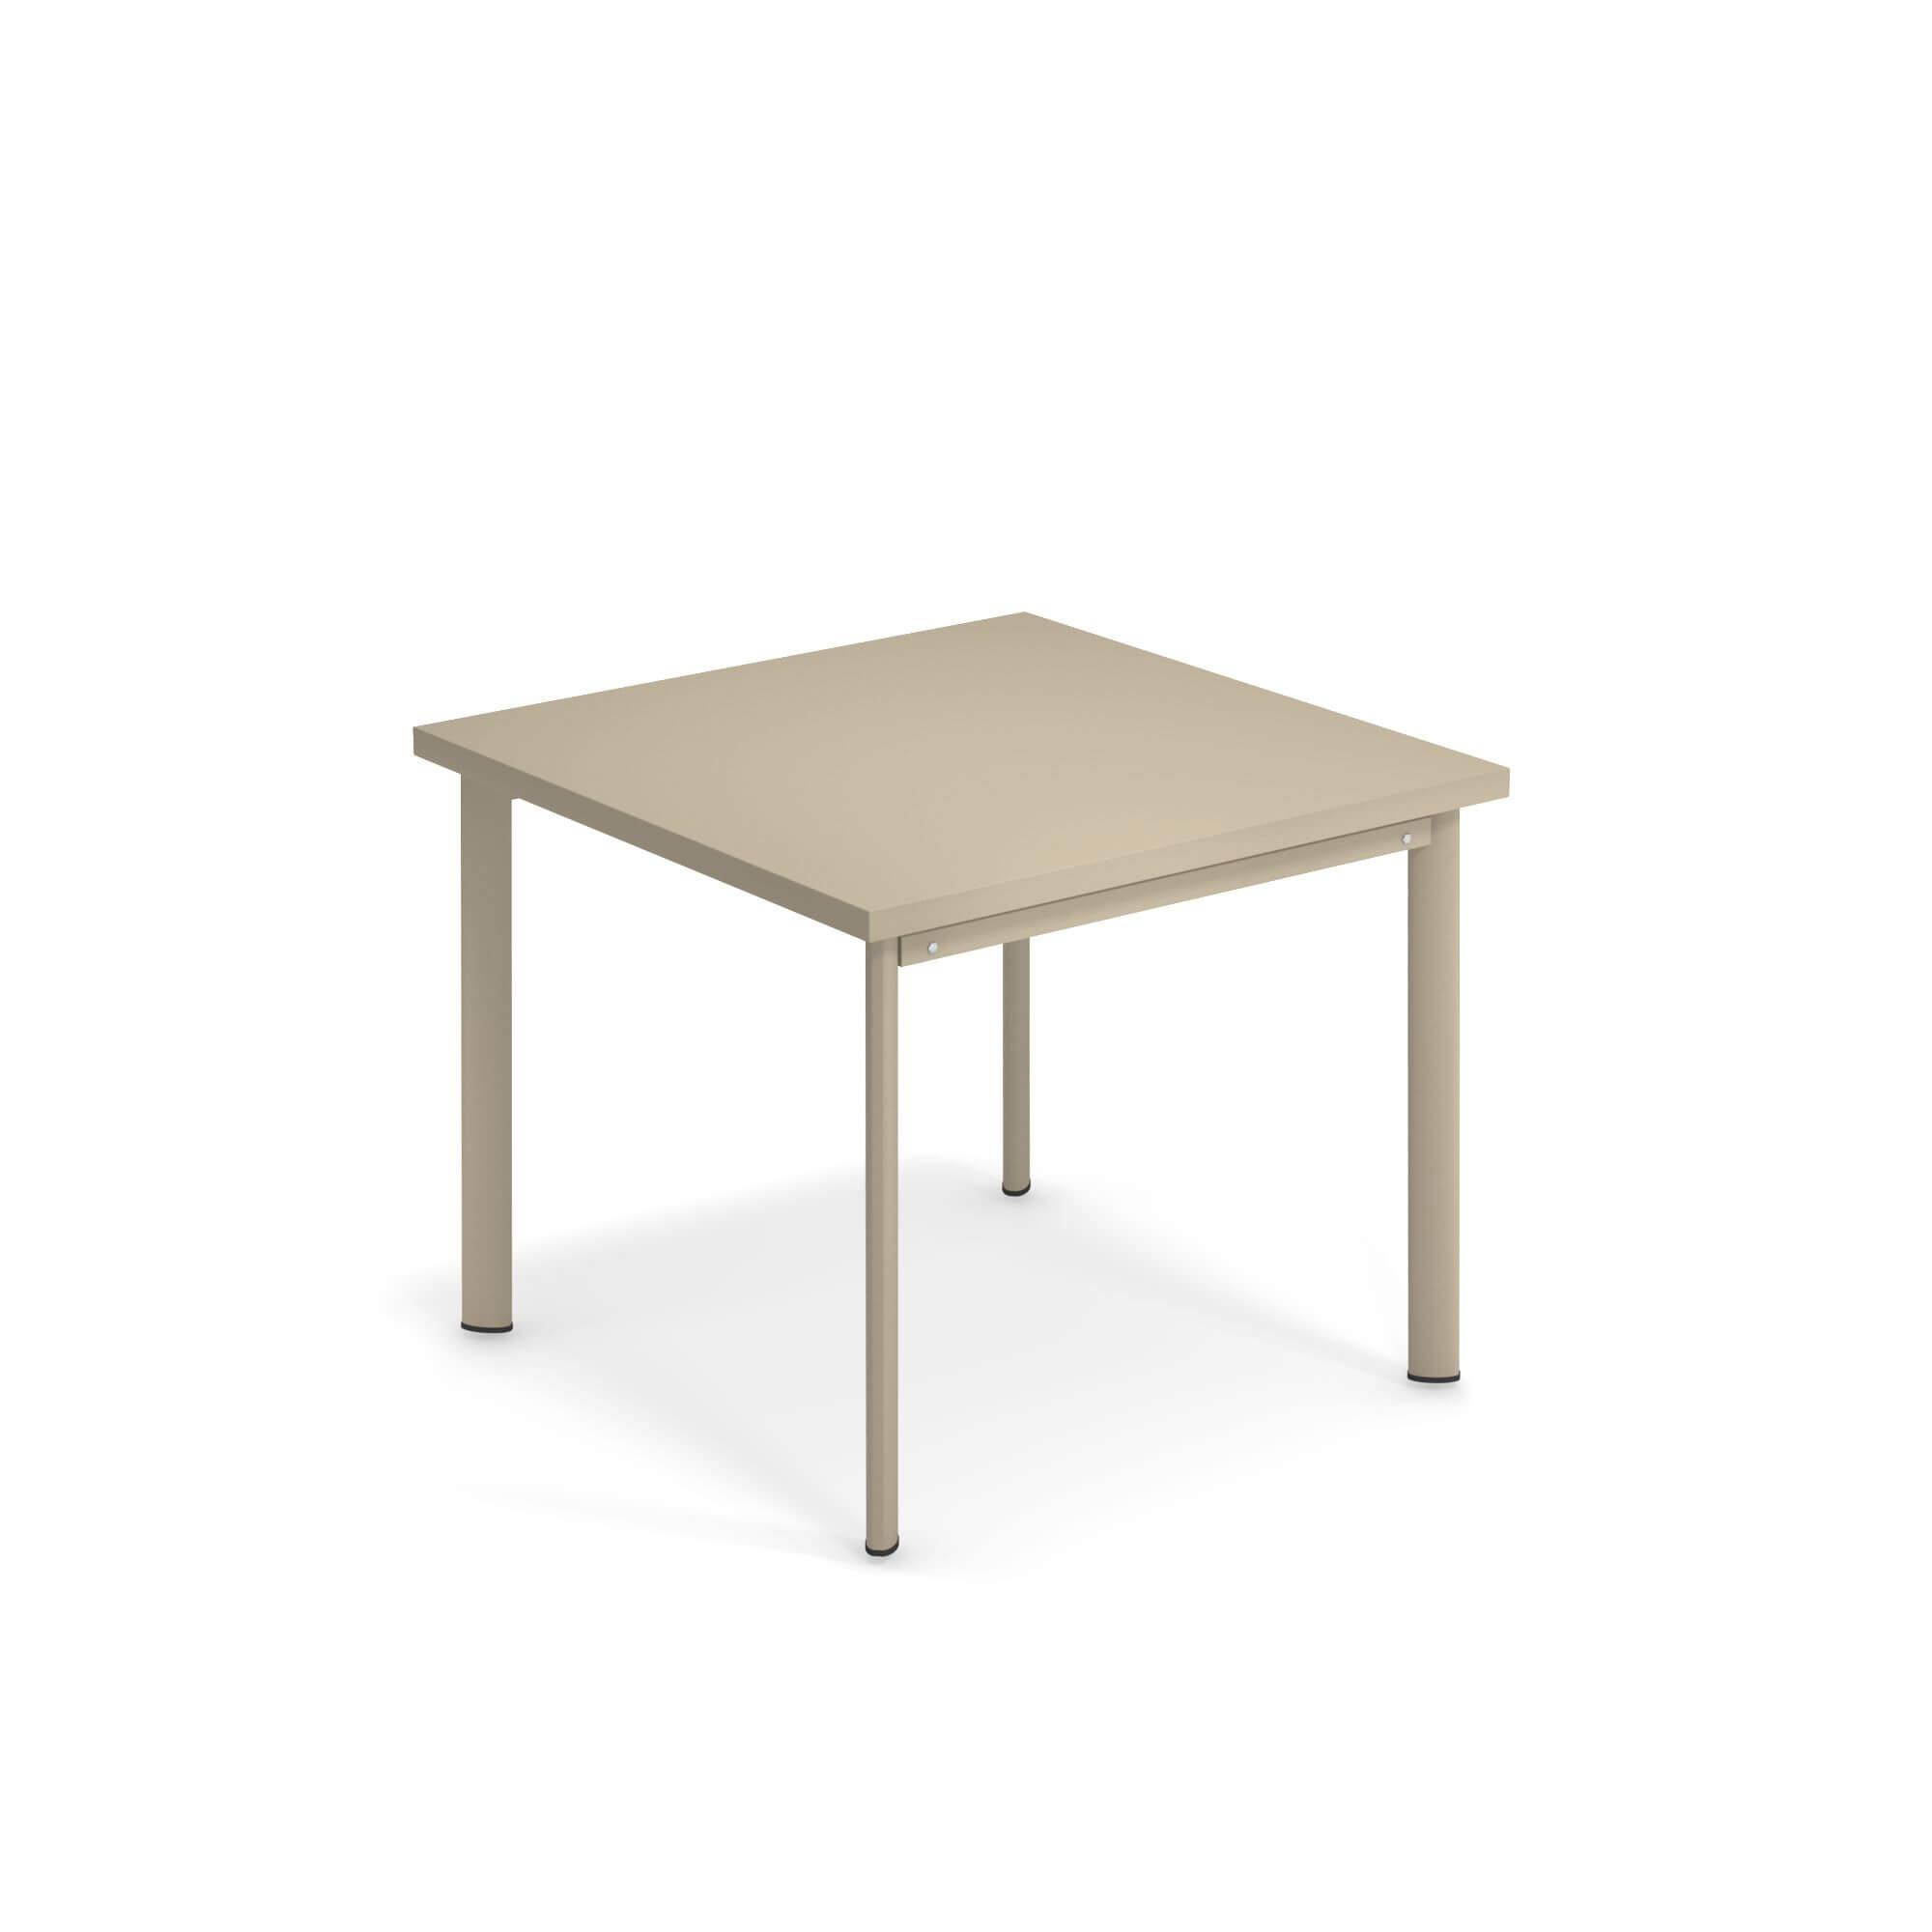 Tavoli Da Giardino Emu.Tavolo Quadrato 90x90 Da Giardino Esterno In Acciaio